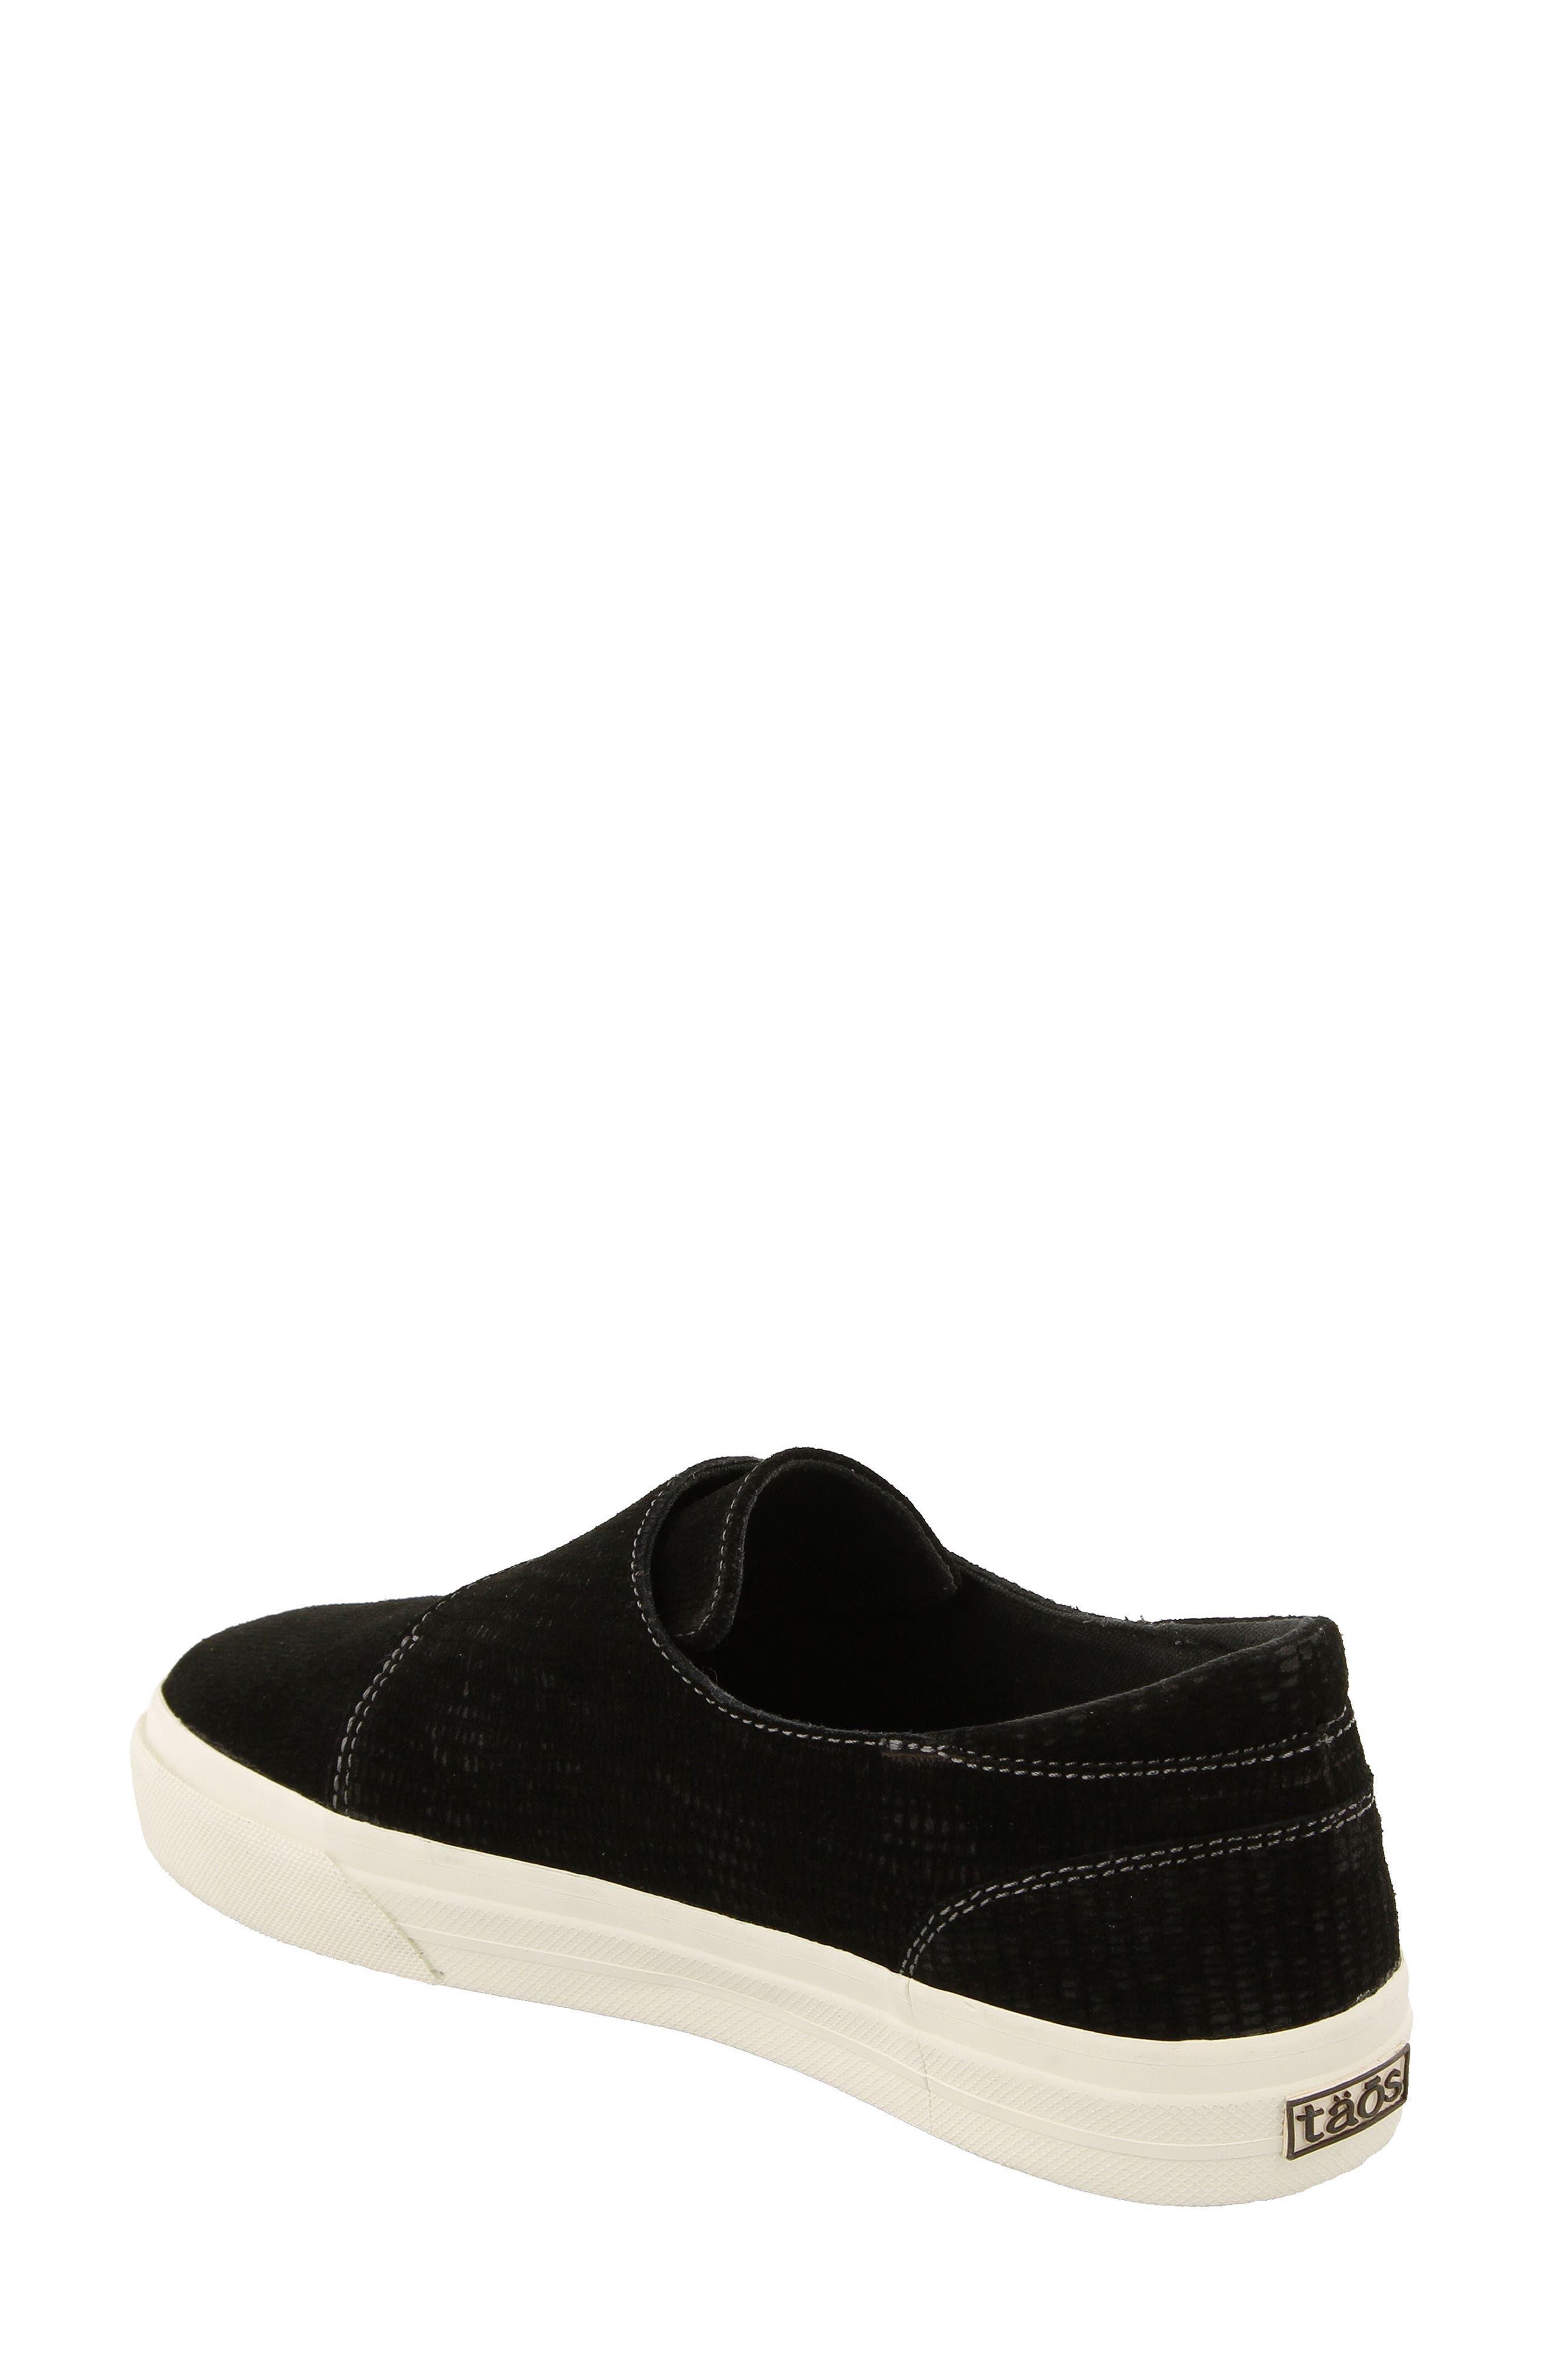 Soul Sneaker,                             Alternate thumbnail 2, color,                             Black Emboss Suede